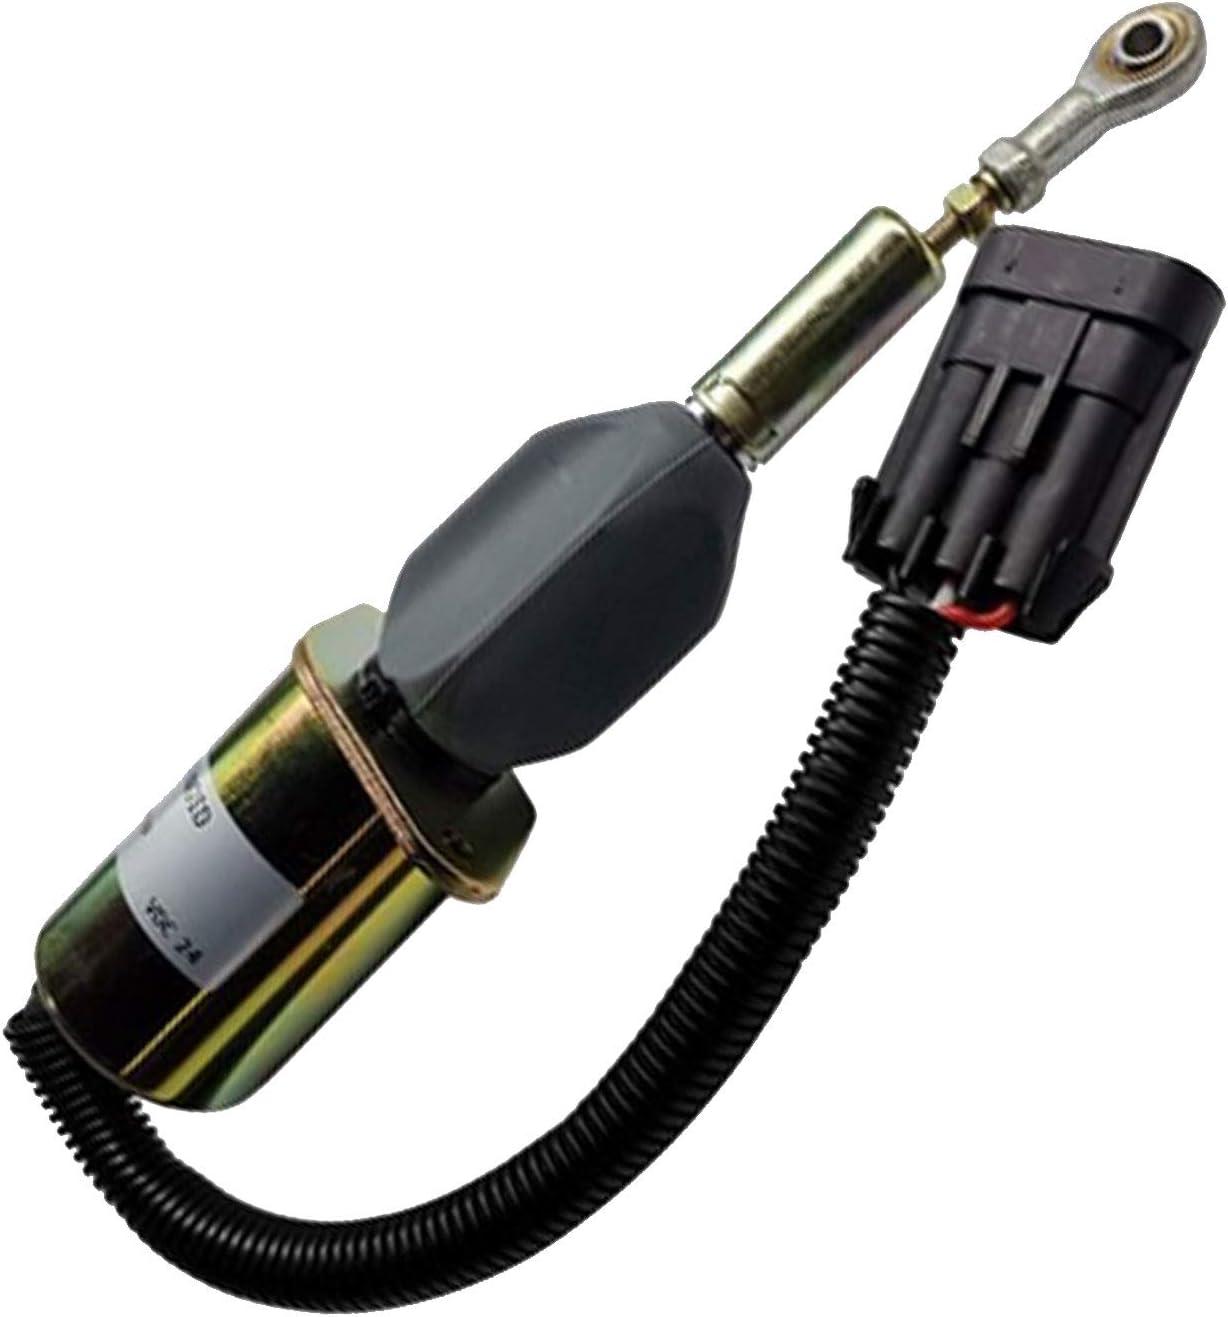 Notonmek 3939019 SA-4889-24 24V Fuel Shutoff Solenoid for Cummins Engine QSL9.3 C/&B 5.9L 8.3L Hyundai Excavator 335LC-7